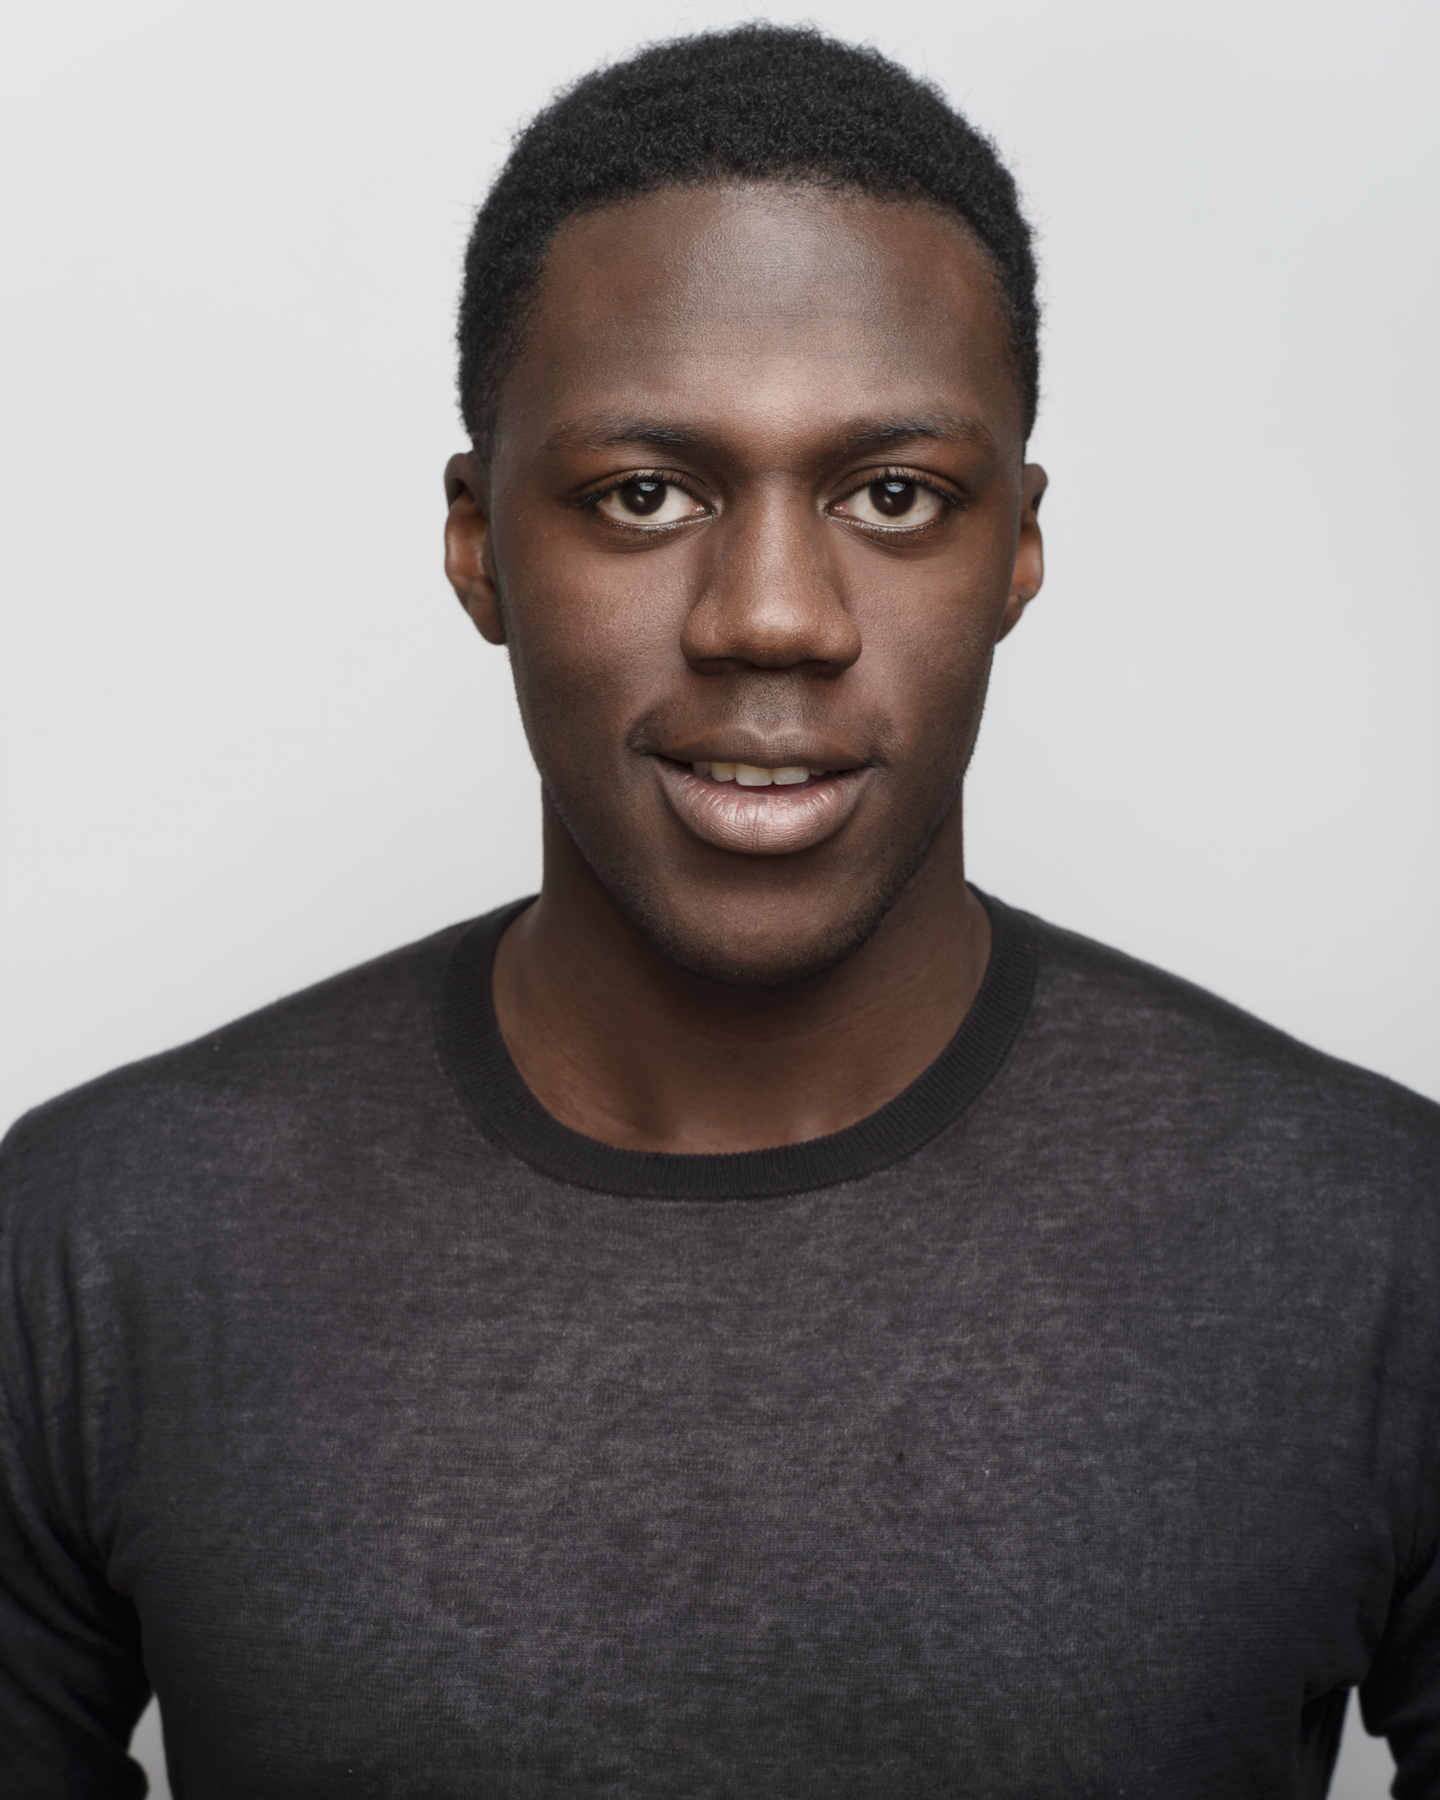 Edward_Nkom_actor HSA_associates